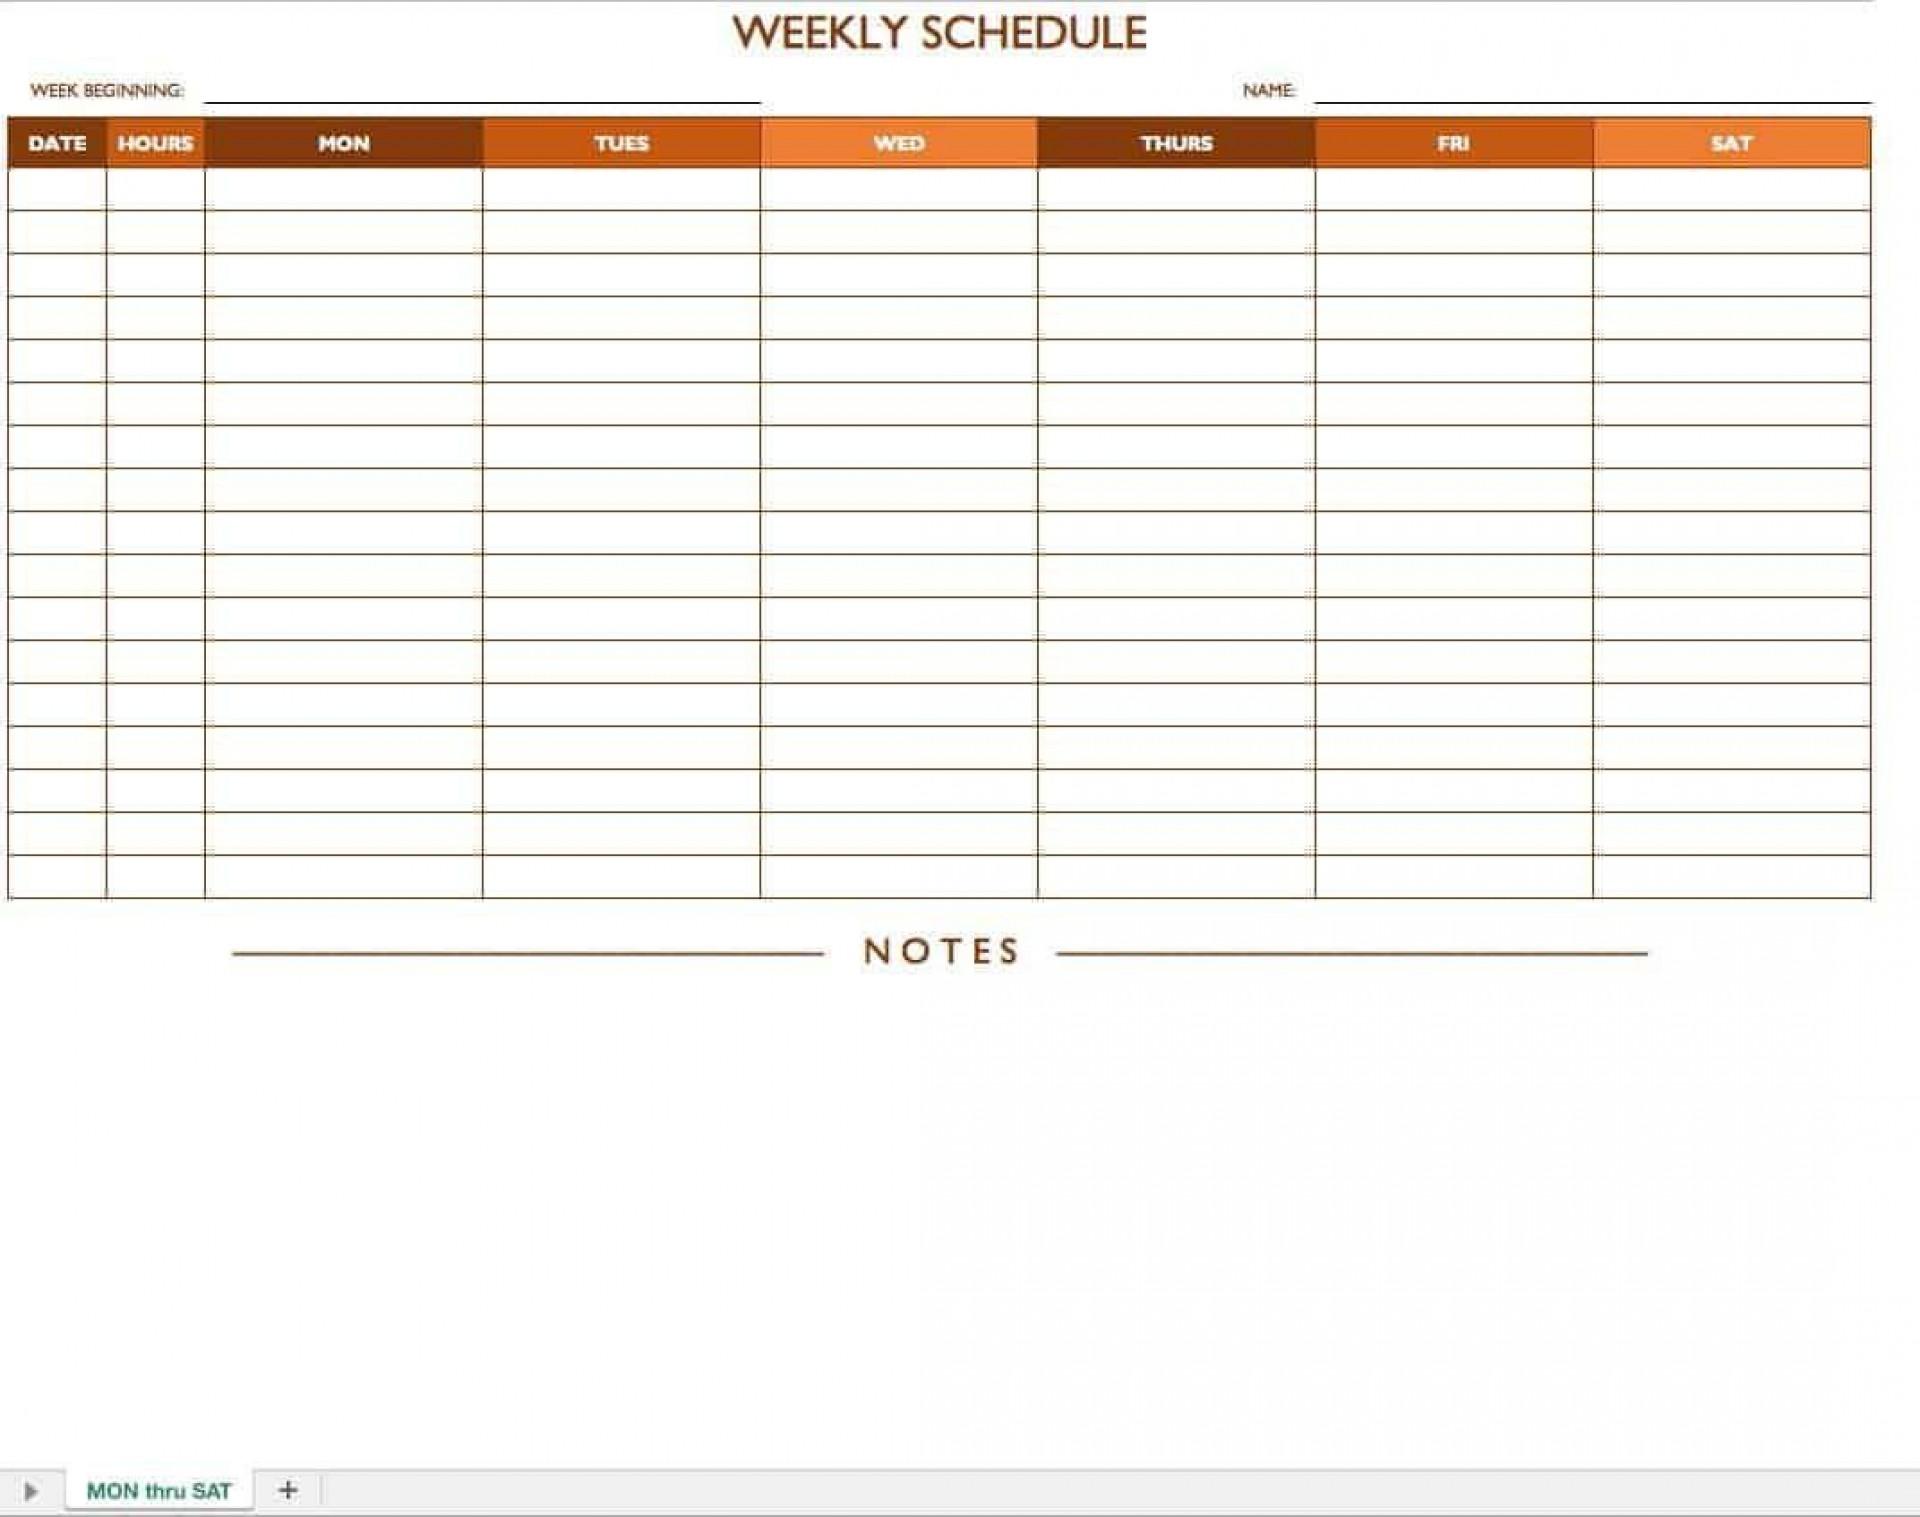 006 Unusual Free Employee Work Schedule Template Sample  Templates Monthly Excel Weekly Pdf1920